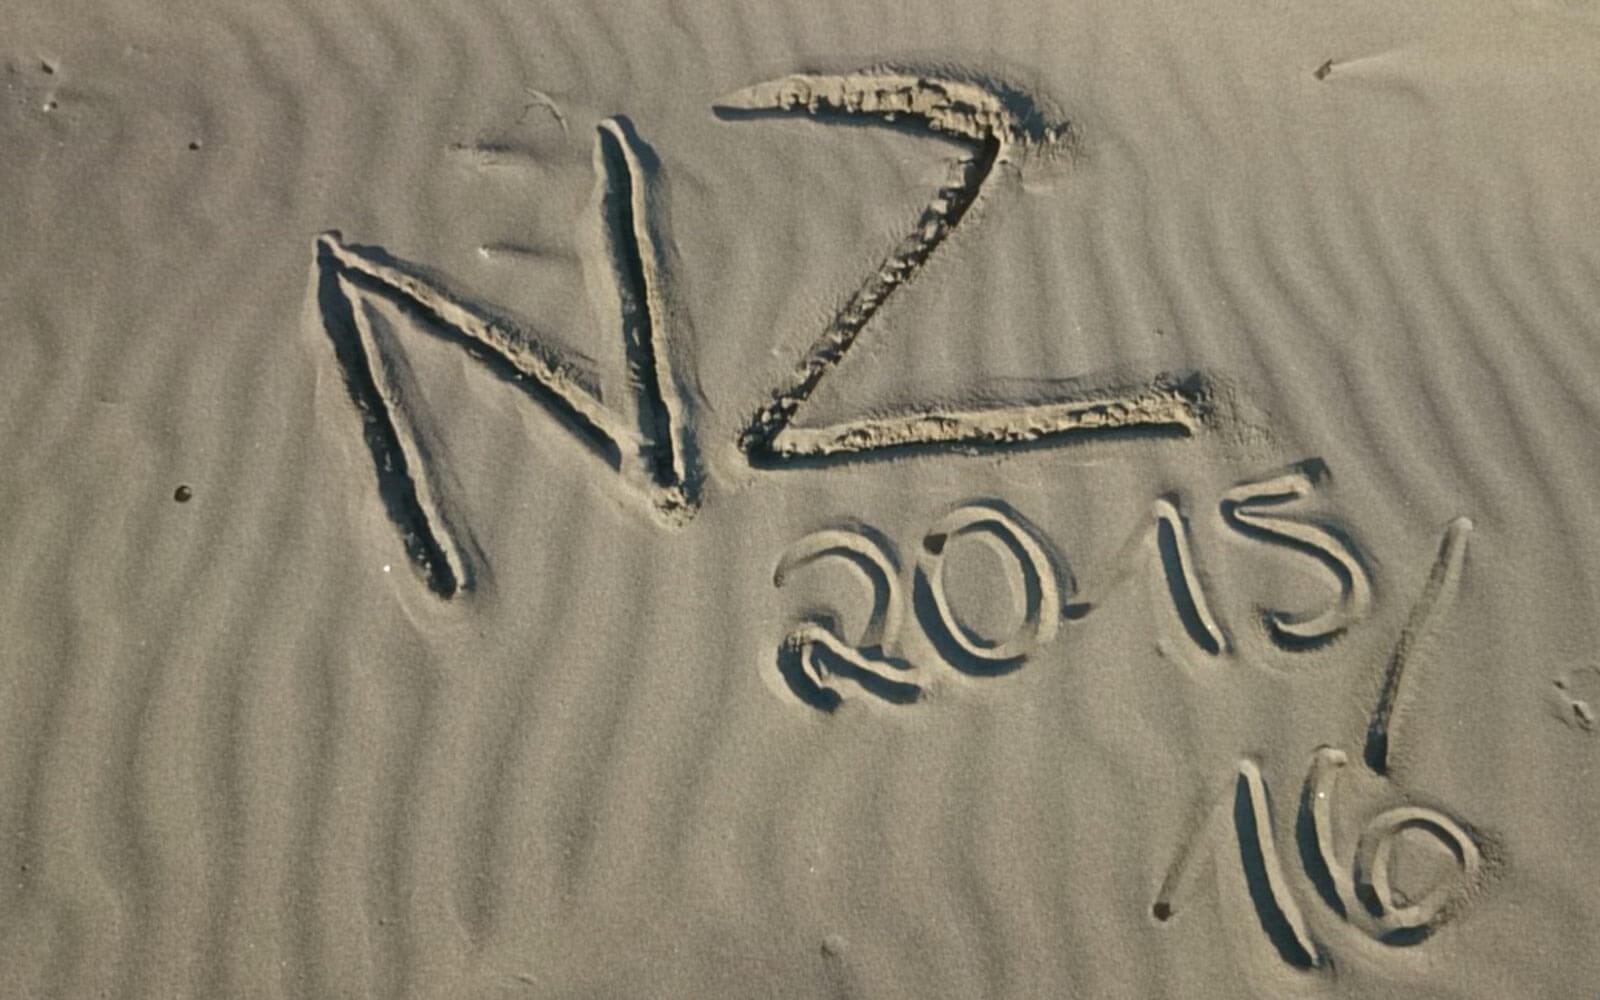 Neuseeland 15/16 am Strand